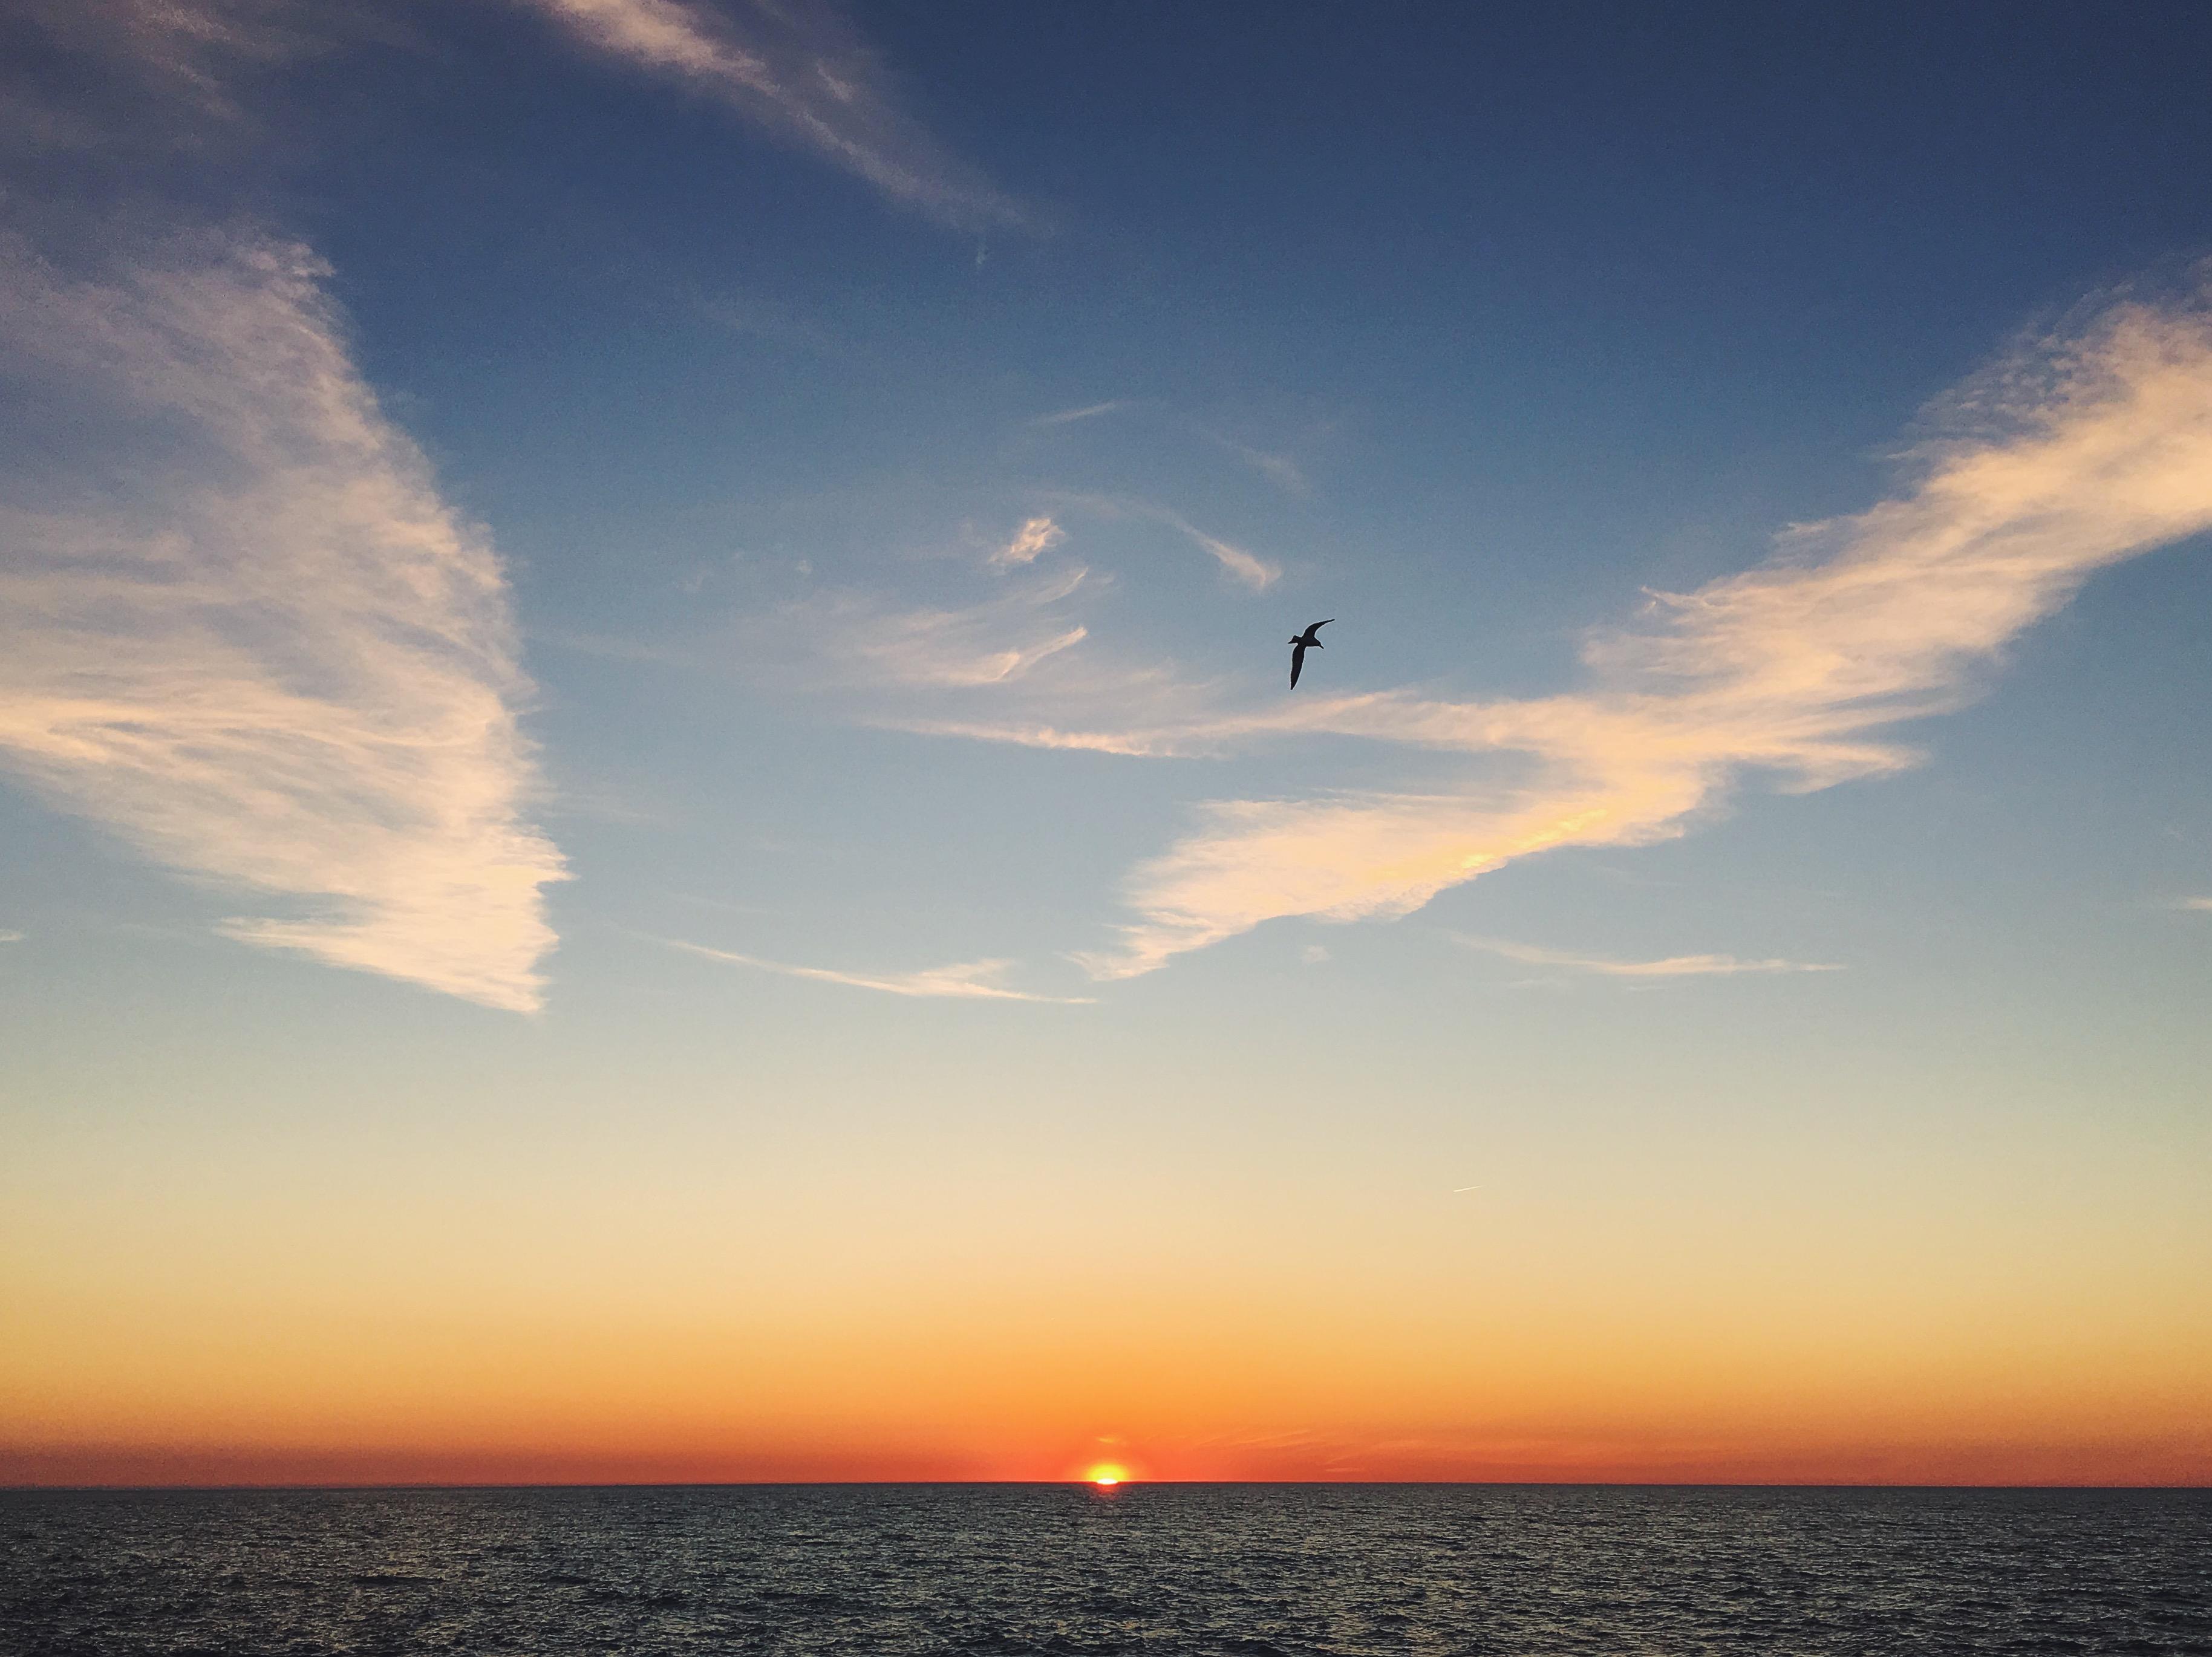 Lake Michigan sunset | Delightful Crumb